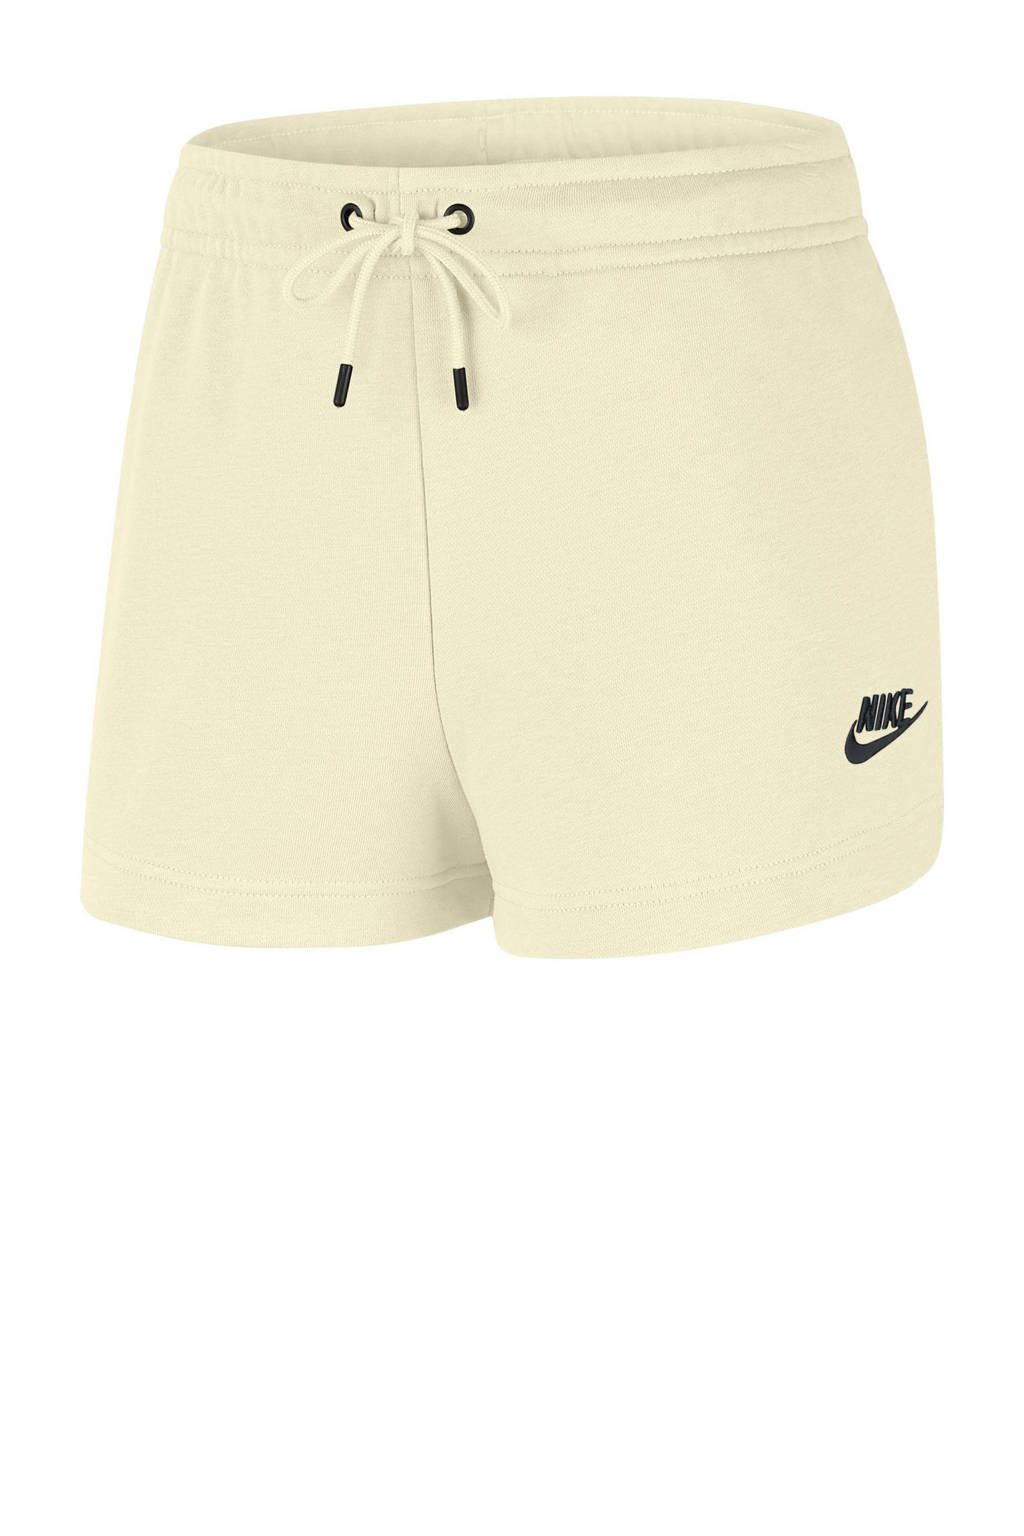 Nike sweatshort lichtgeel, Lichtgeel